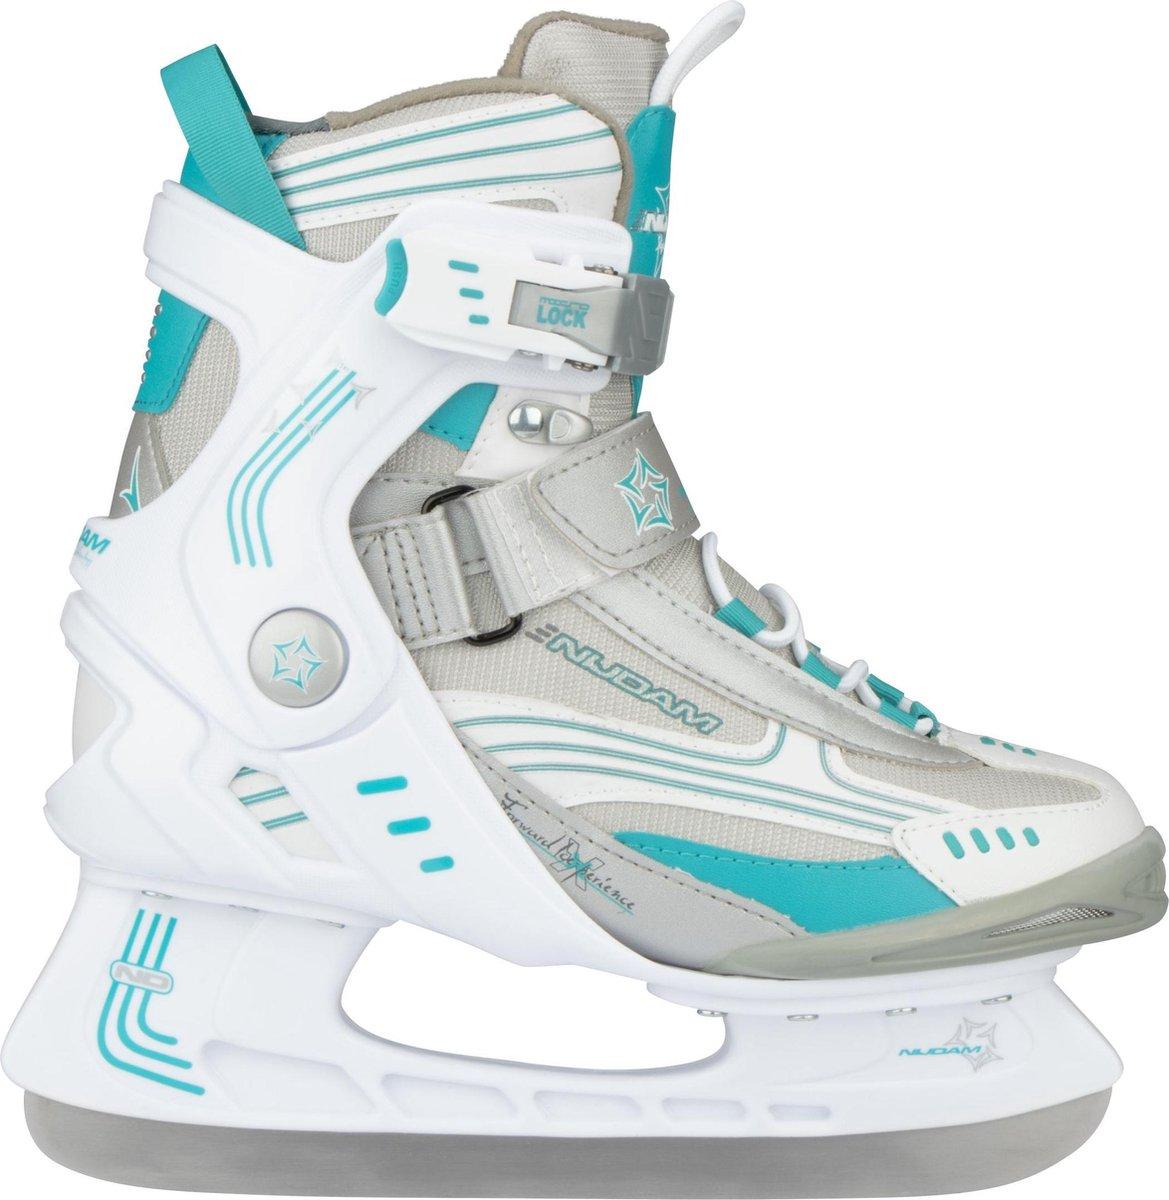 Nijdam 3353 Ijshockeyschaats - Semi-Softboot - Wit/Turquoise - Maat 43